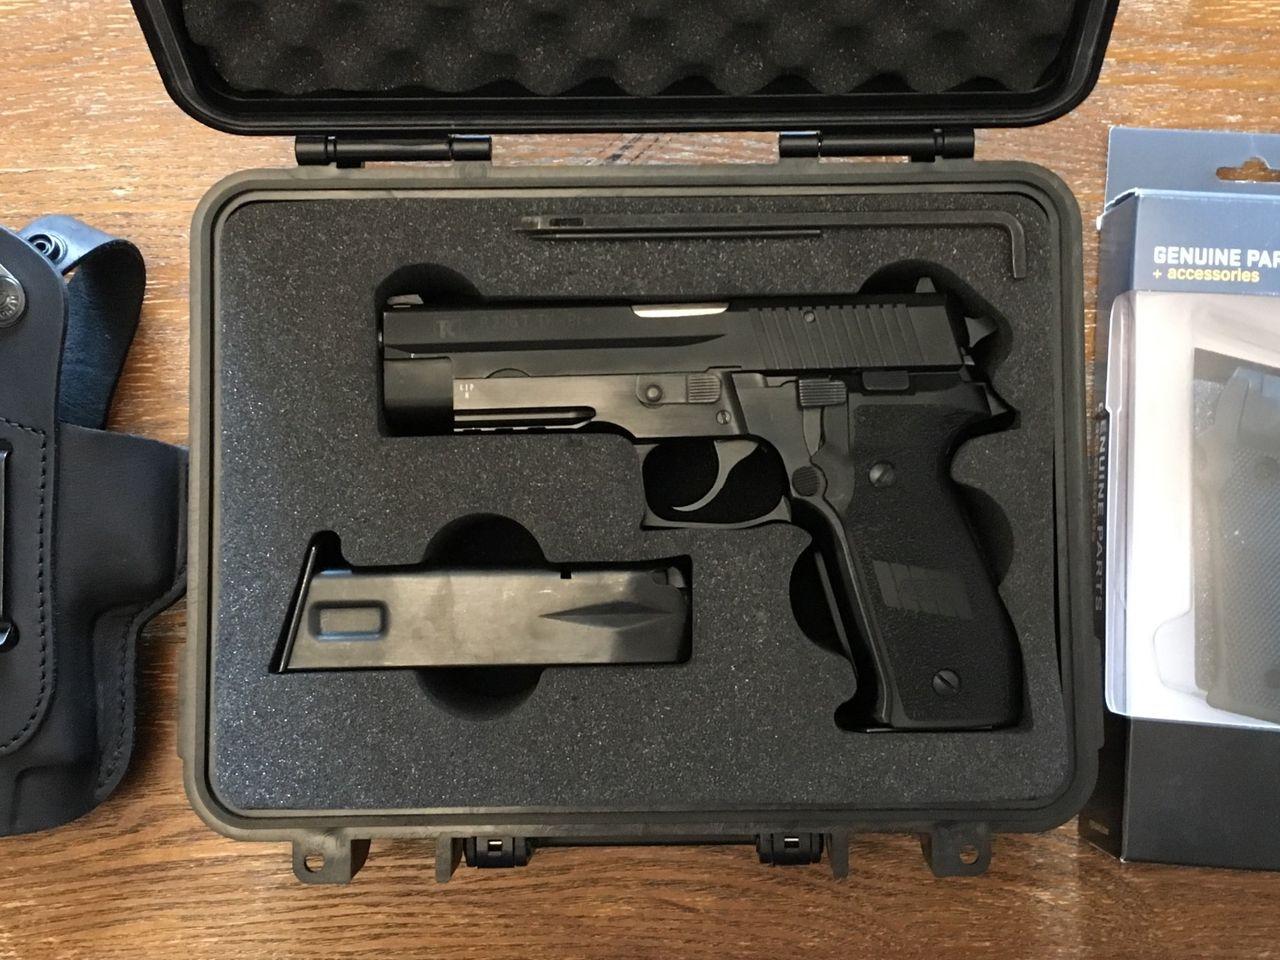 P226T TK-P